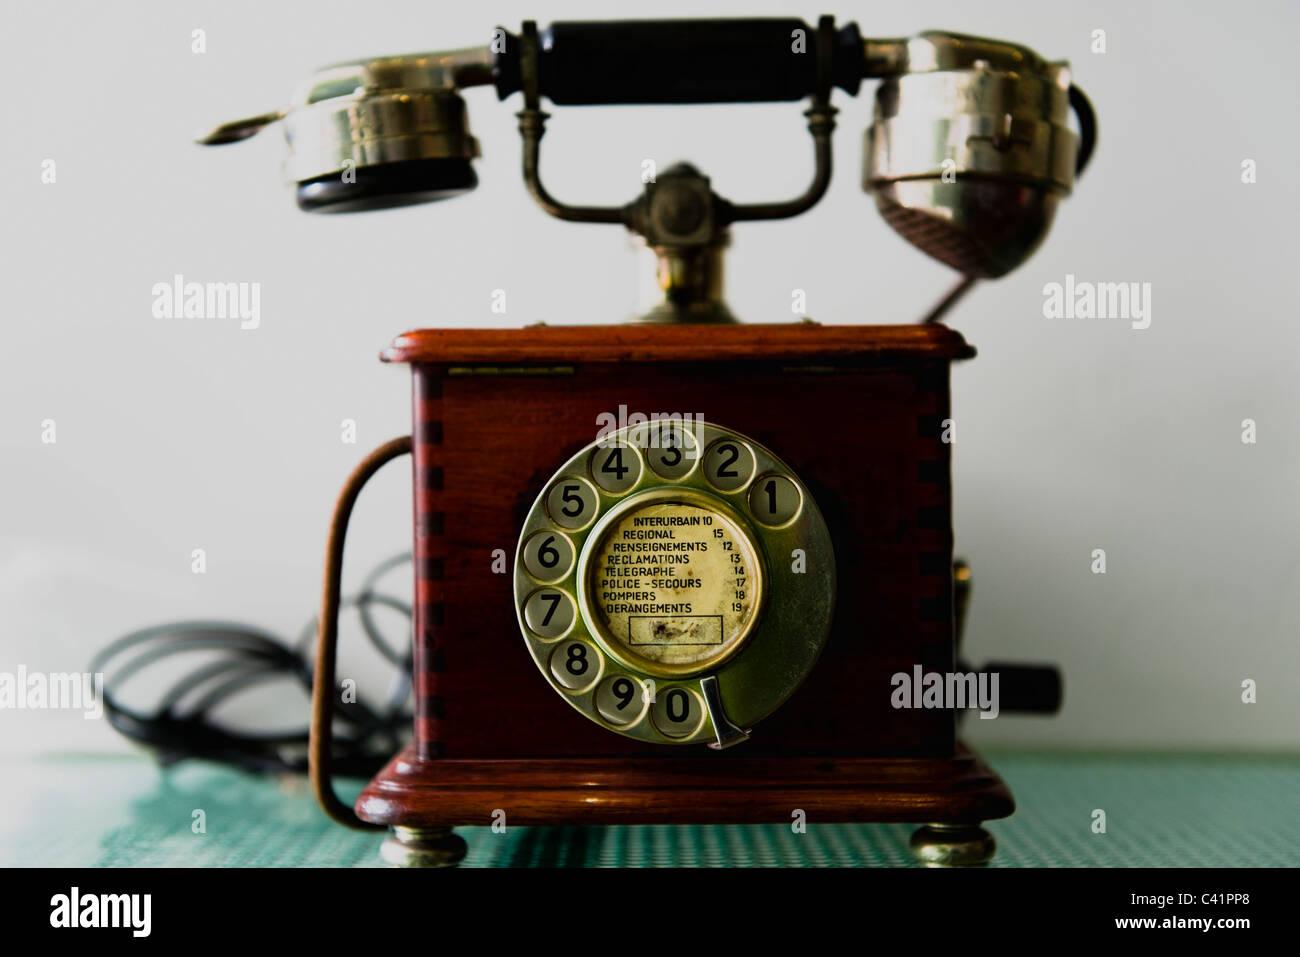 Antique rotary telephone - Stock Image